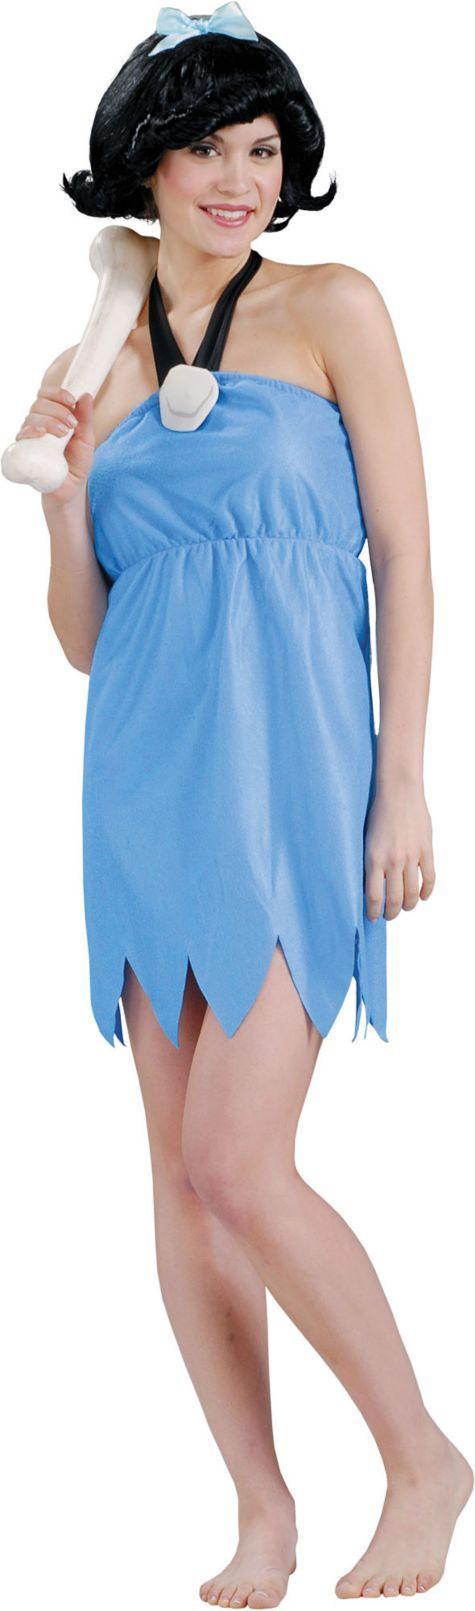 Adult Flintstones Betty Rubble Costume - Party City